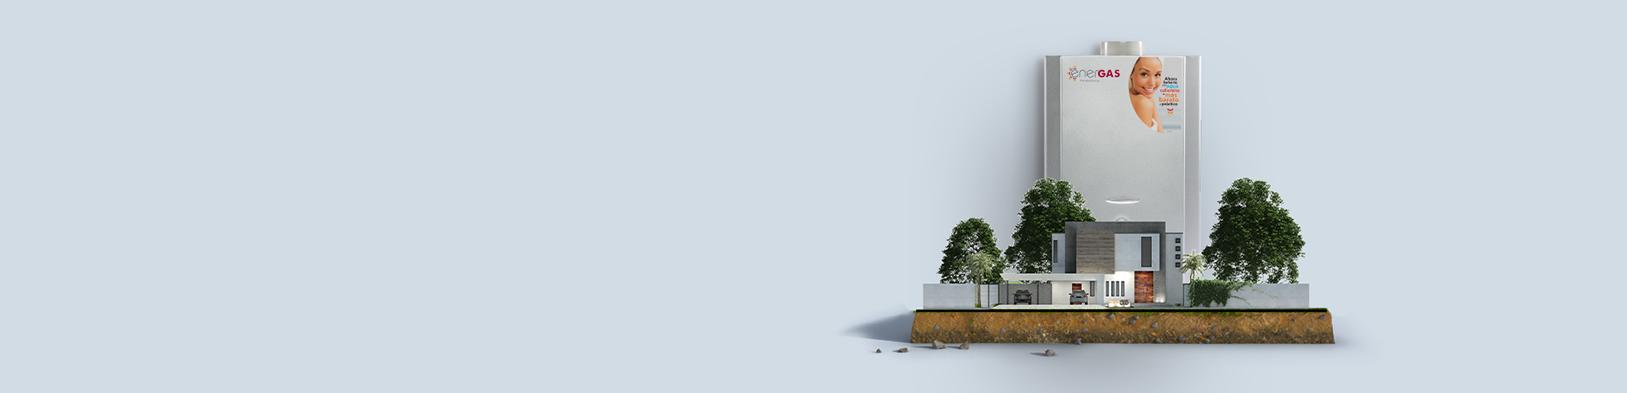 hipoteca-verde.png